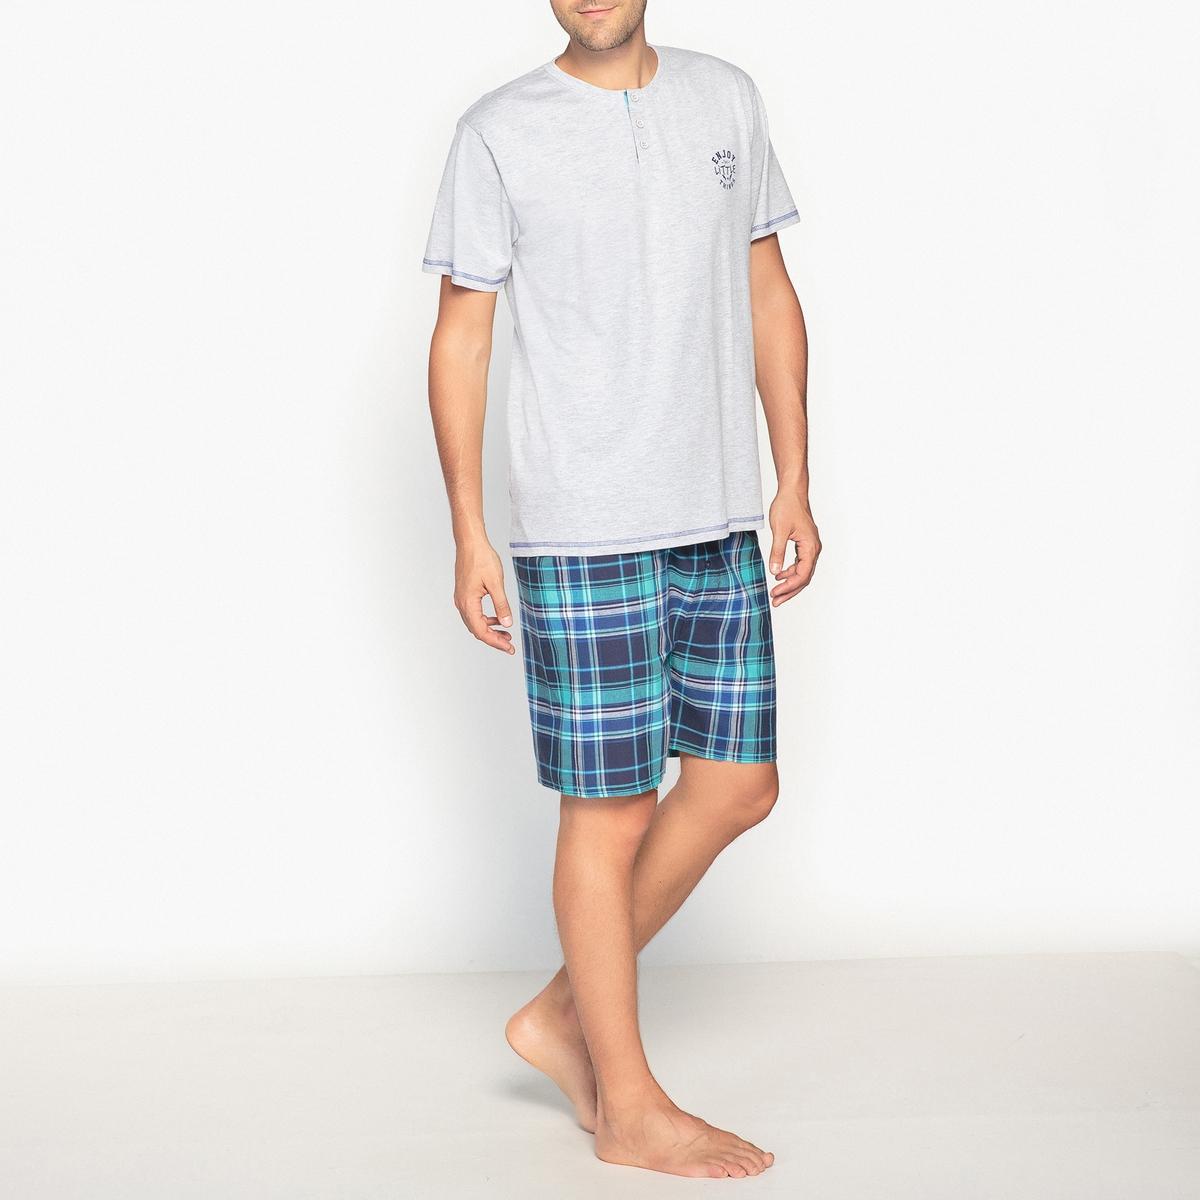 Пижама с принтом и короткими рукавами